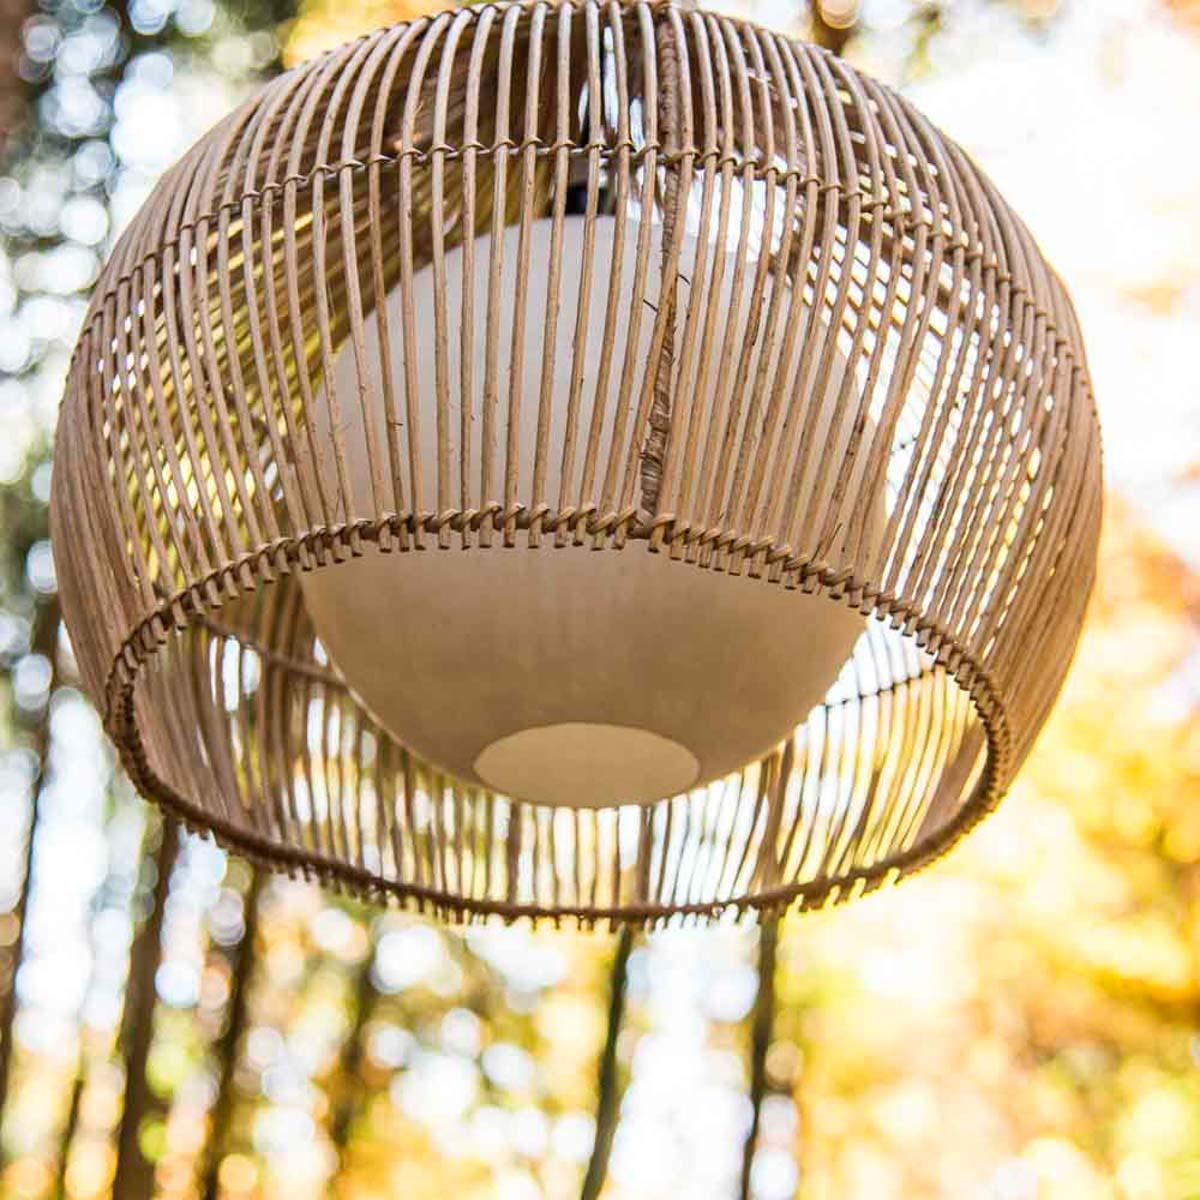 suspension luminaire lampe avec abat jour osier 41 cm. Black Bedroom Furniture Sets. Home Design Ideas